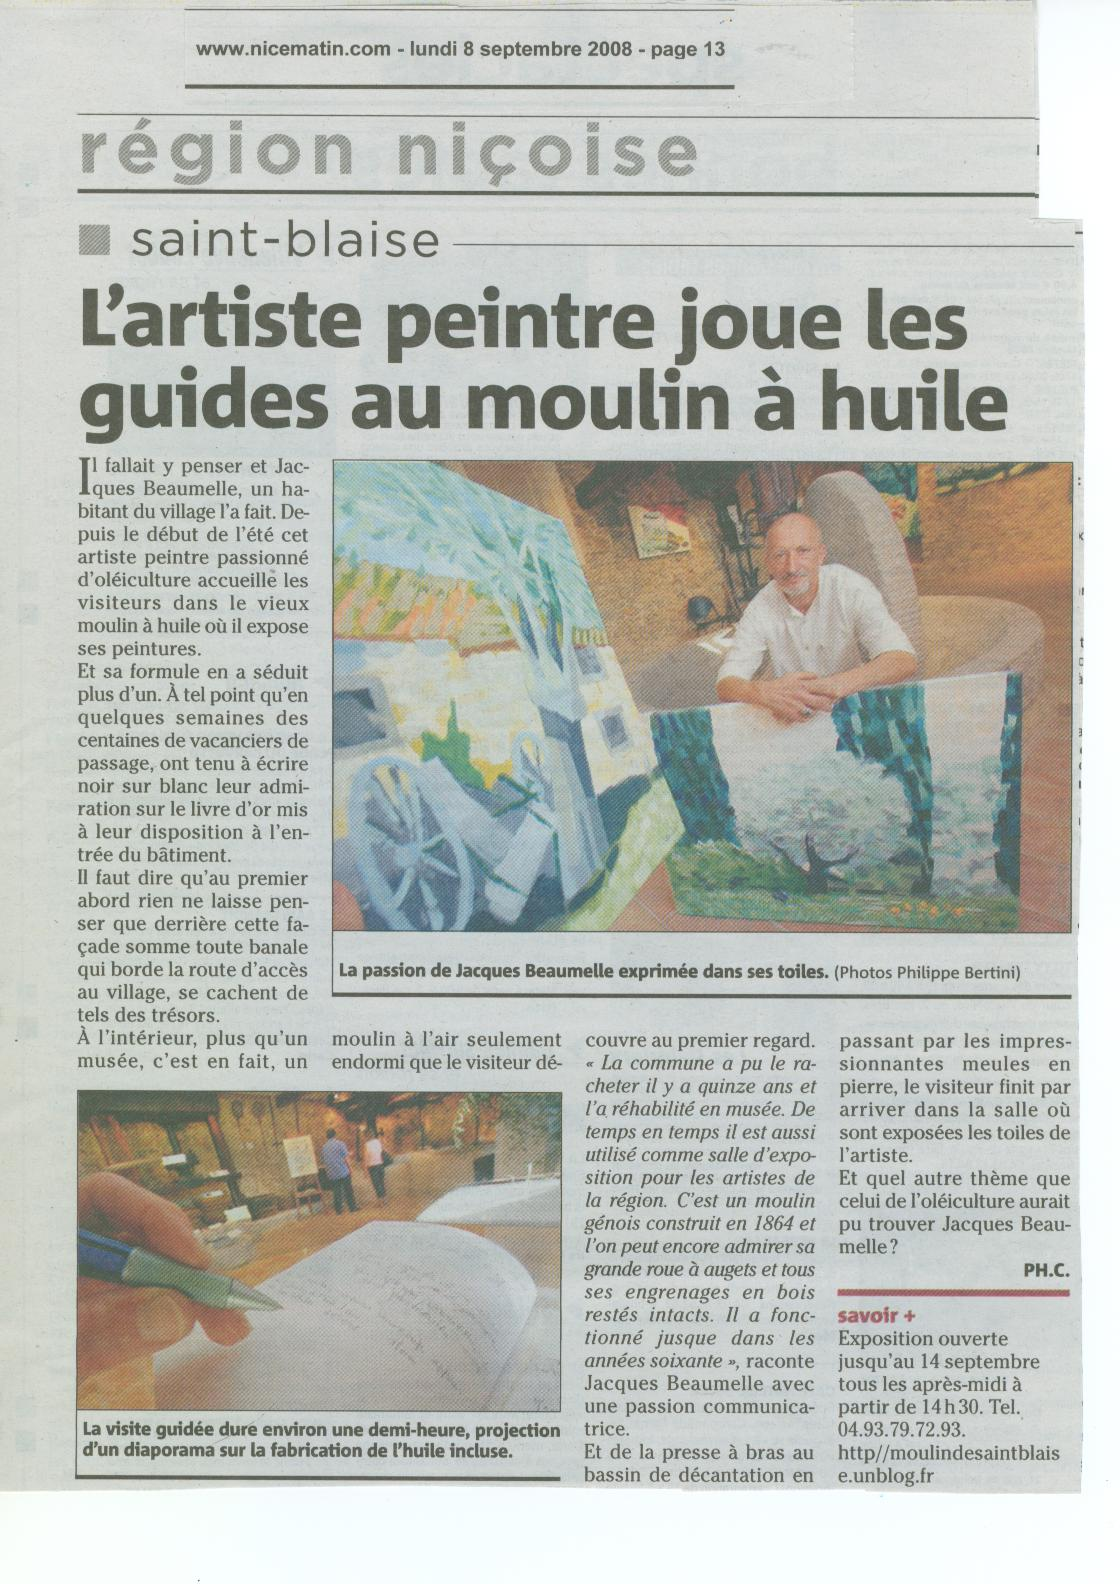 REPORTAGE DE NICE MATIN 08-09-2008